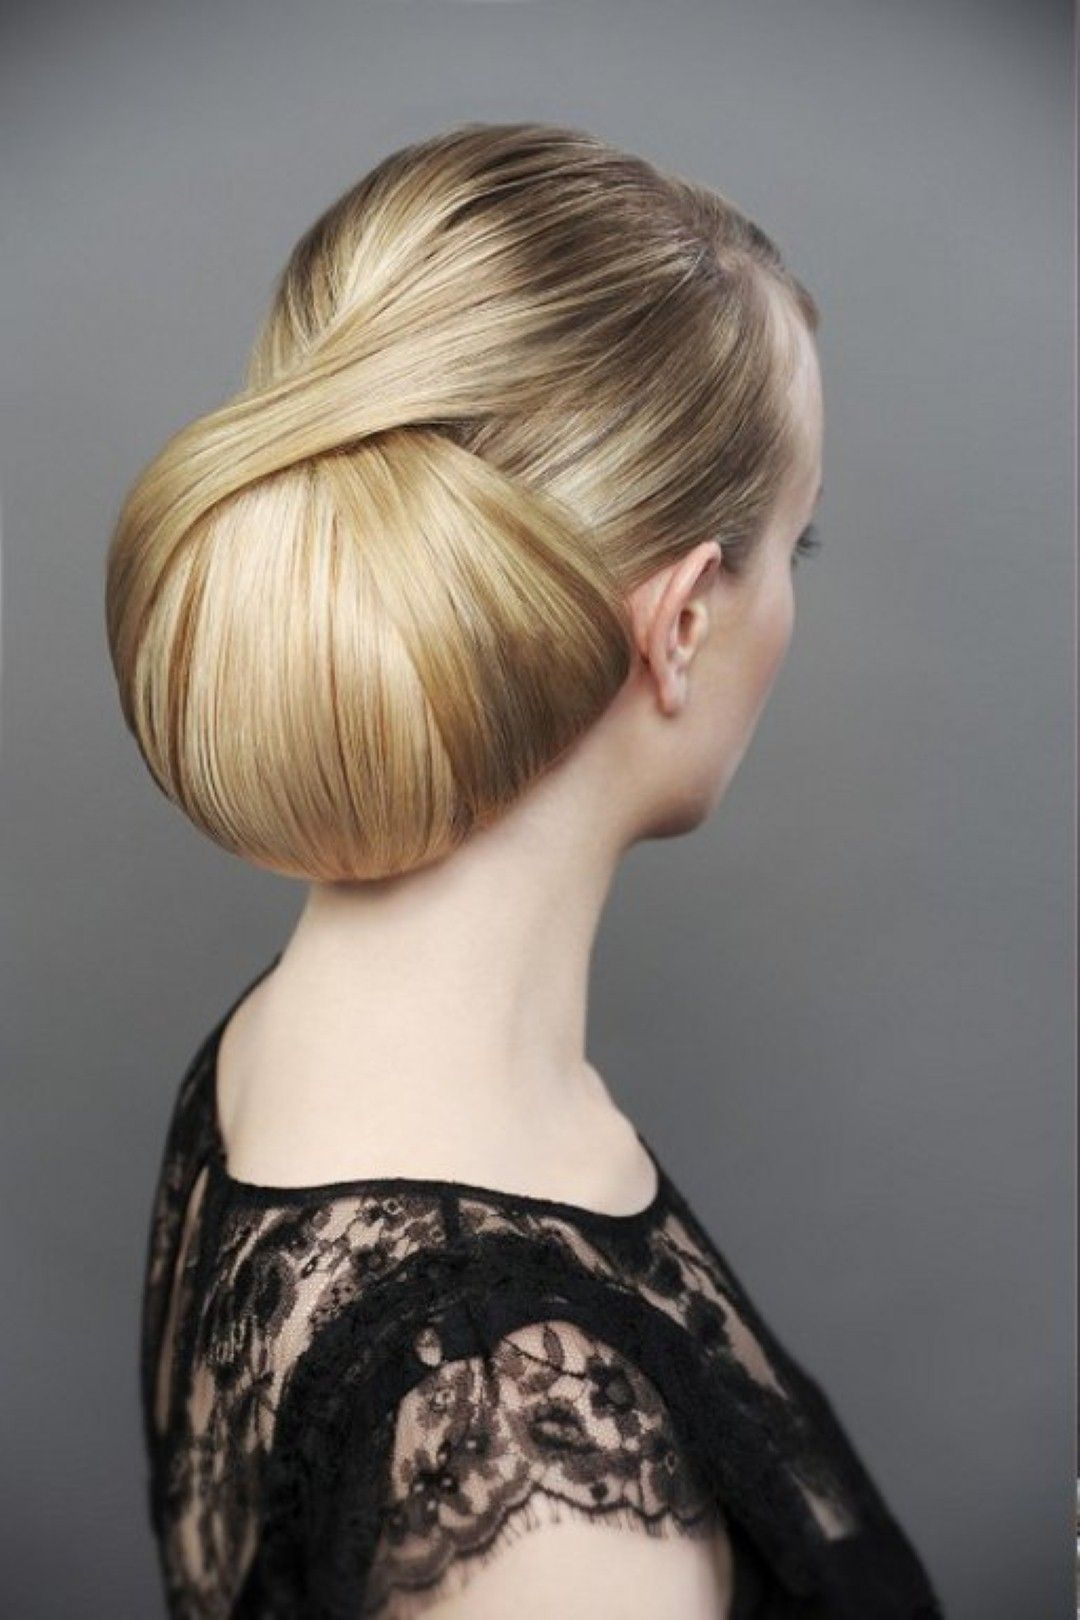 long wedding hairstyles wrapped updo | celeberity style | pinterest